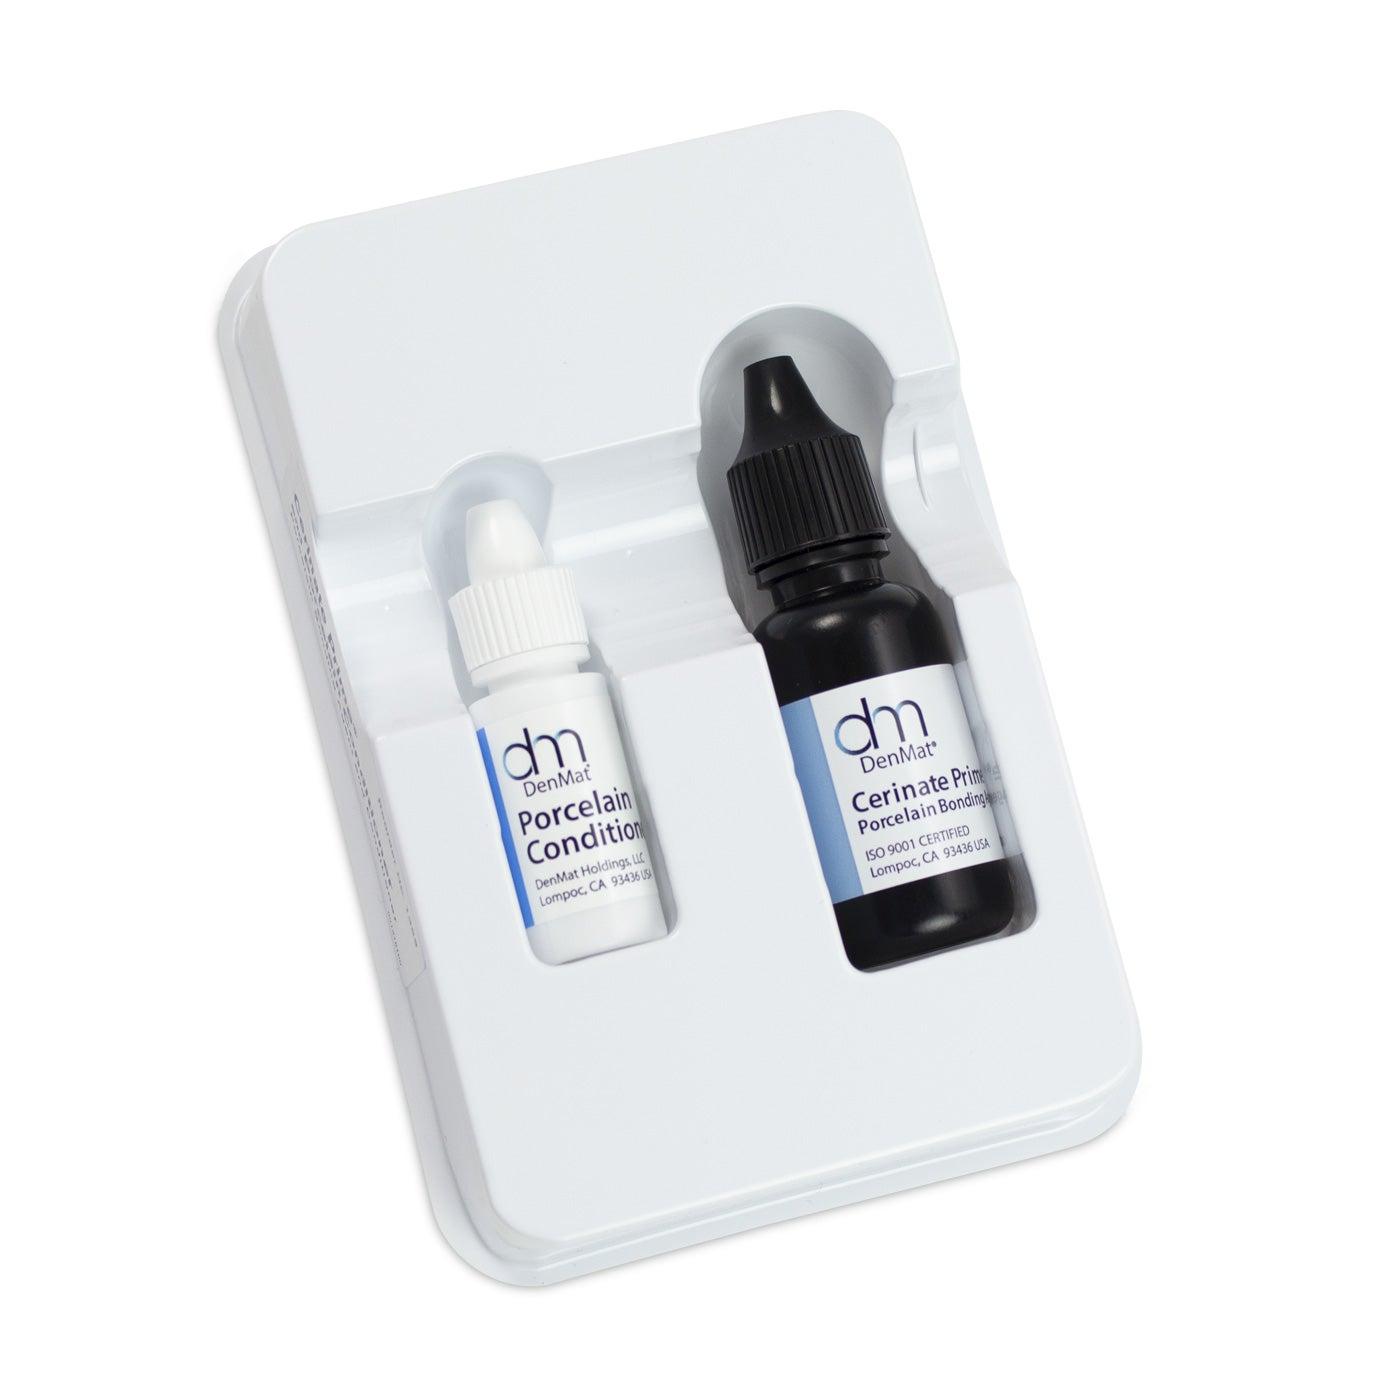 Dental Porcelain Conditioner - Cerinate Prime Conditioner